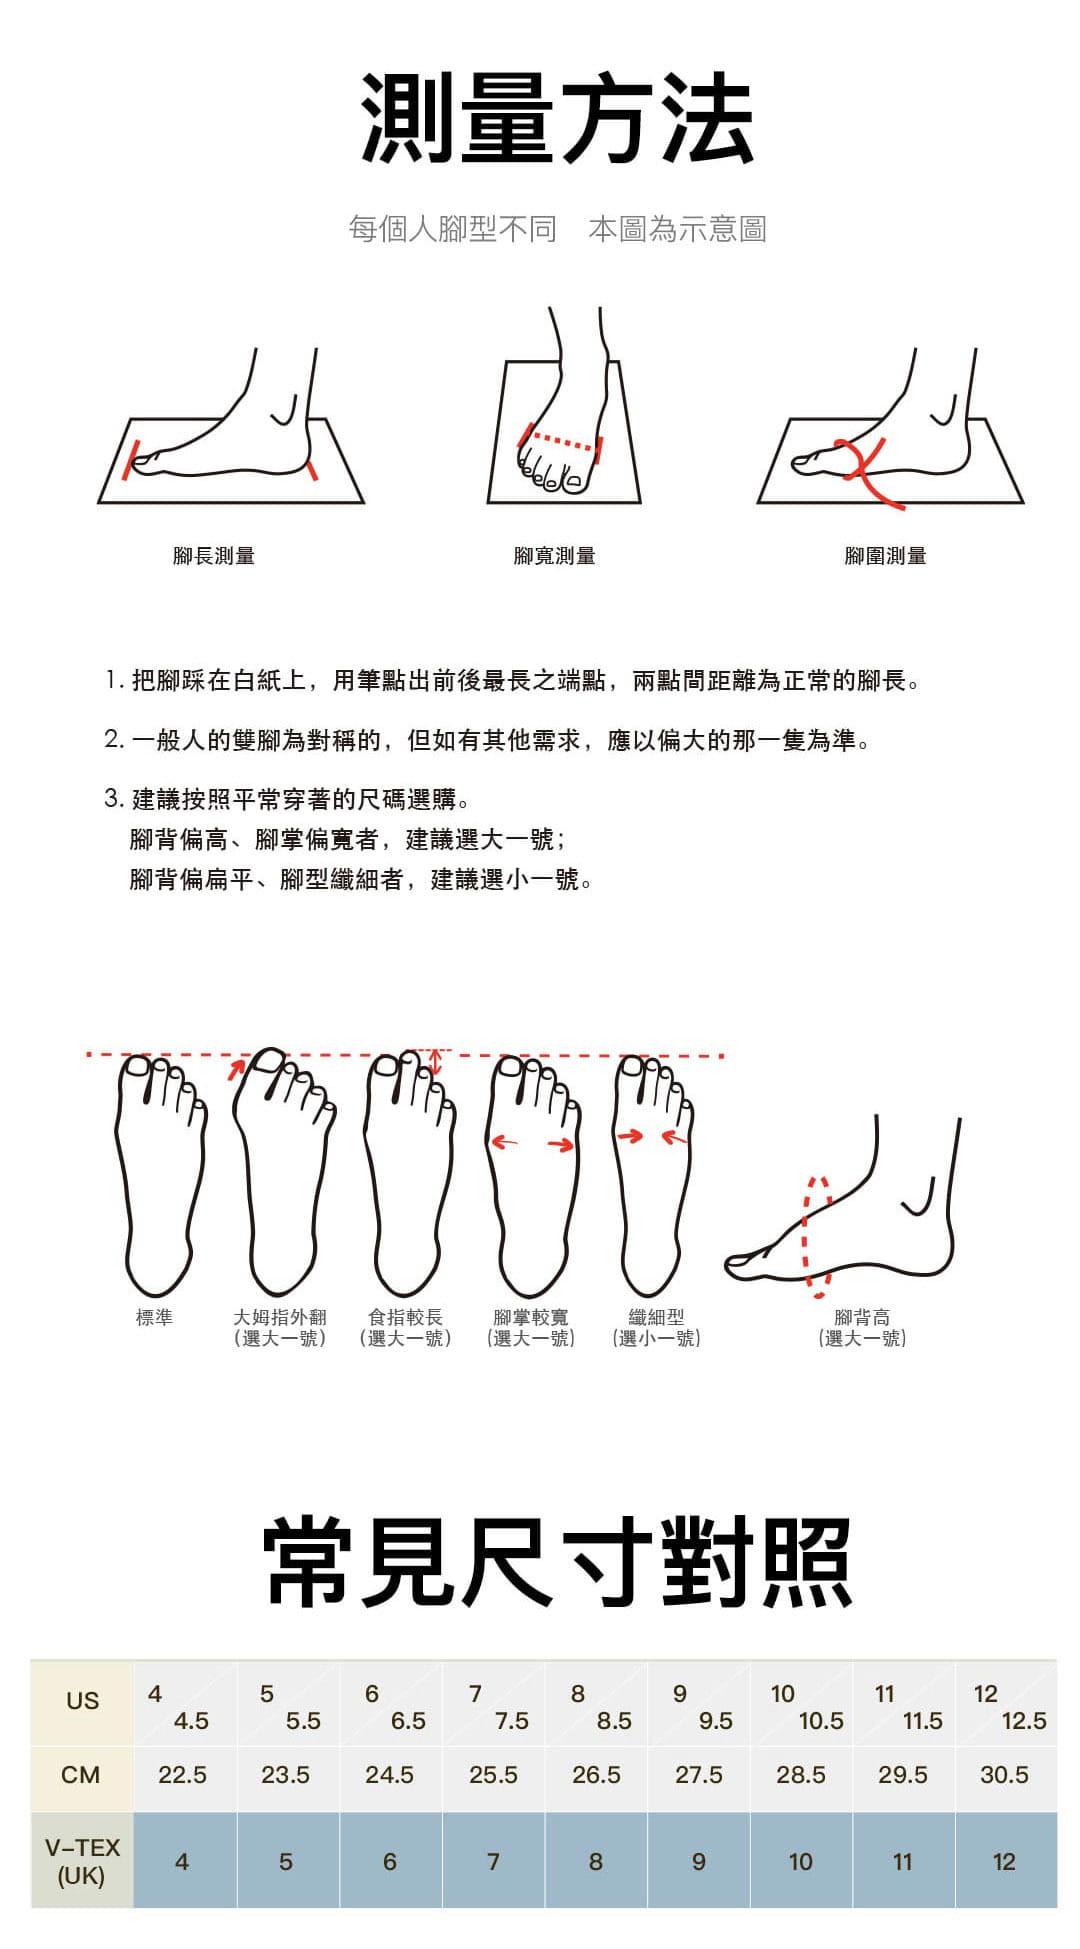 【V-TEX 地表最強防水鞋】【V-TEX機能防水鞋】 雙11優選款式 (3款任選) 18